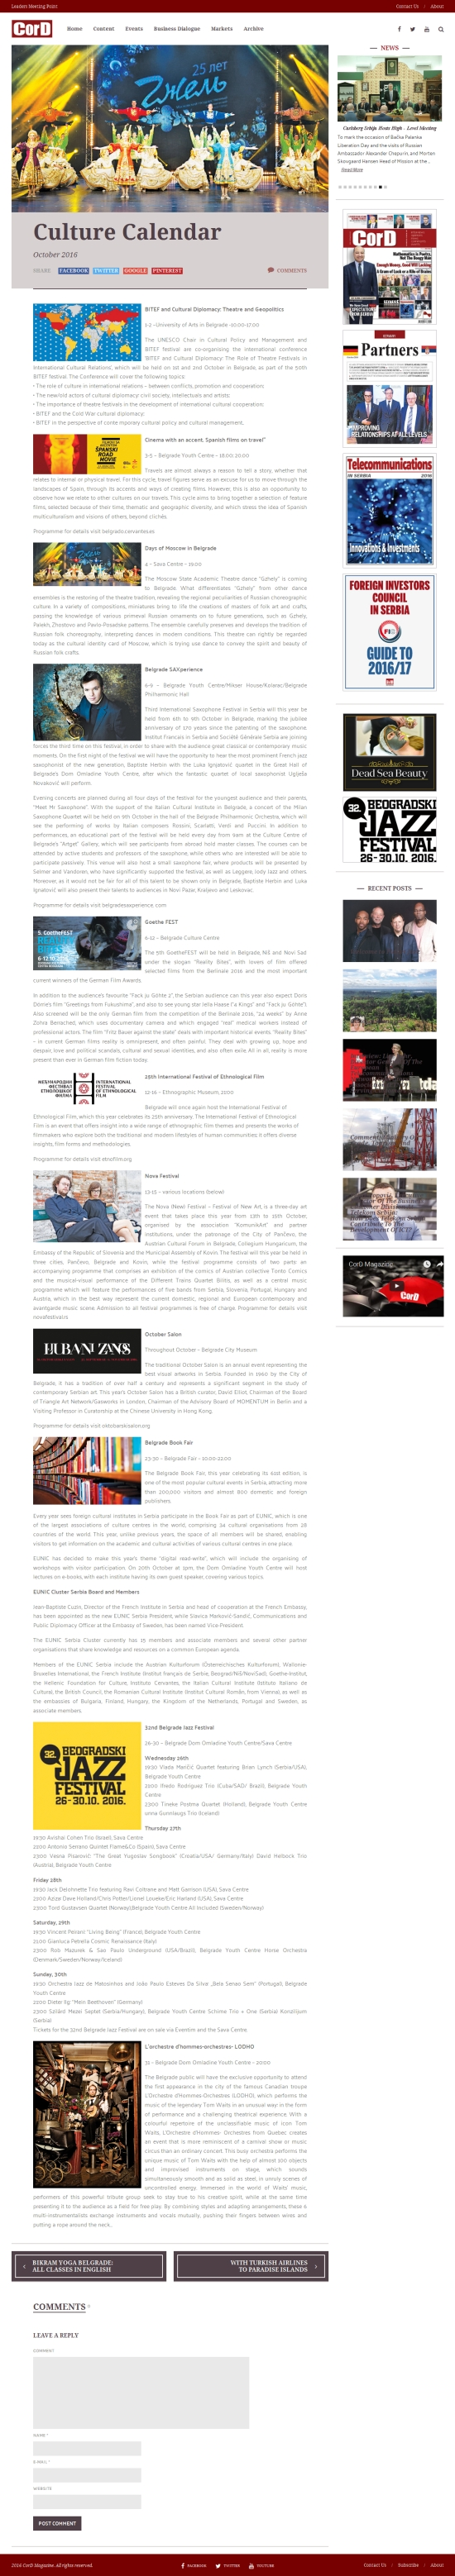 0110-cordmagazine-com-culture-calendar